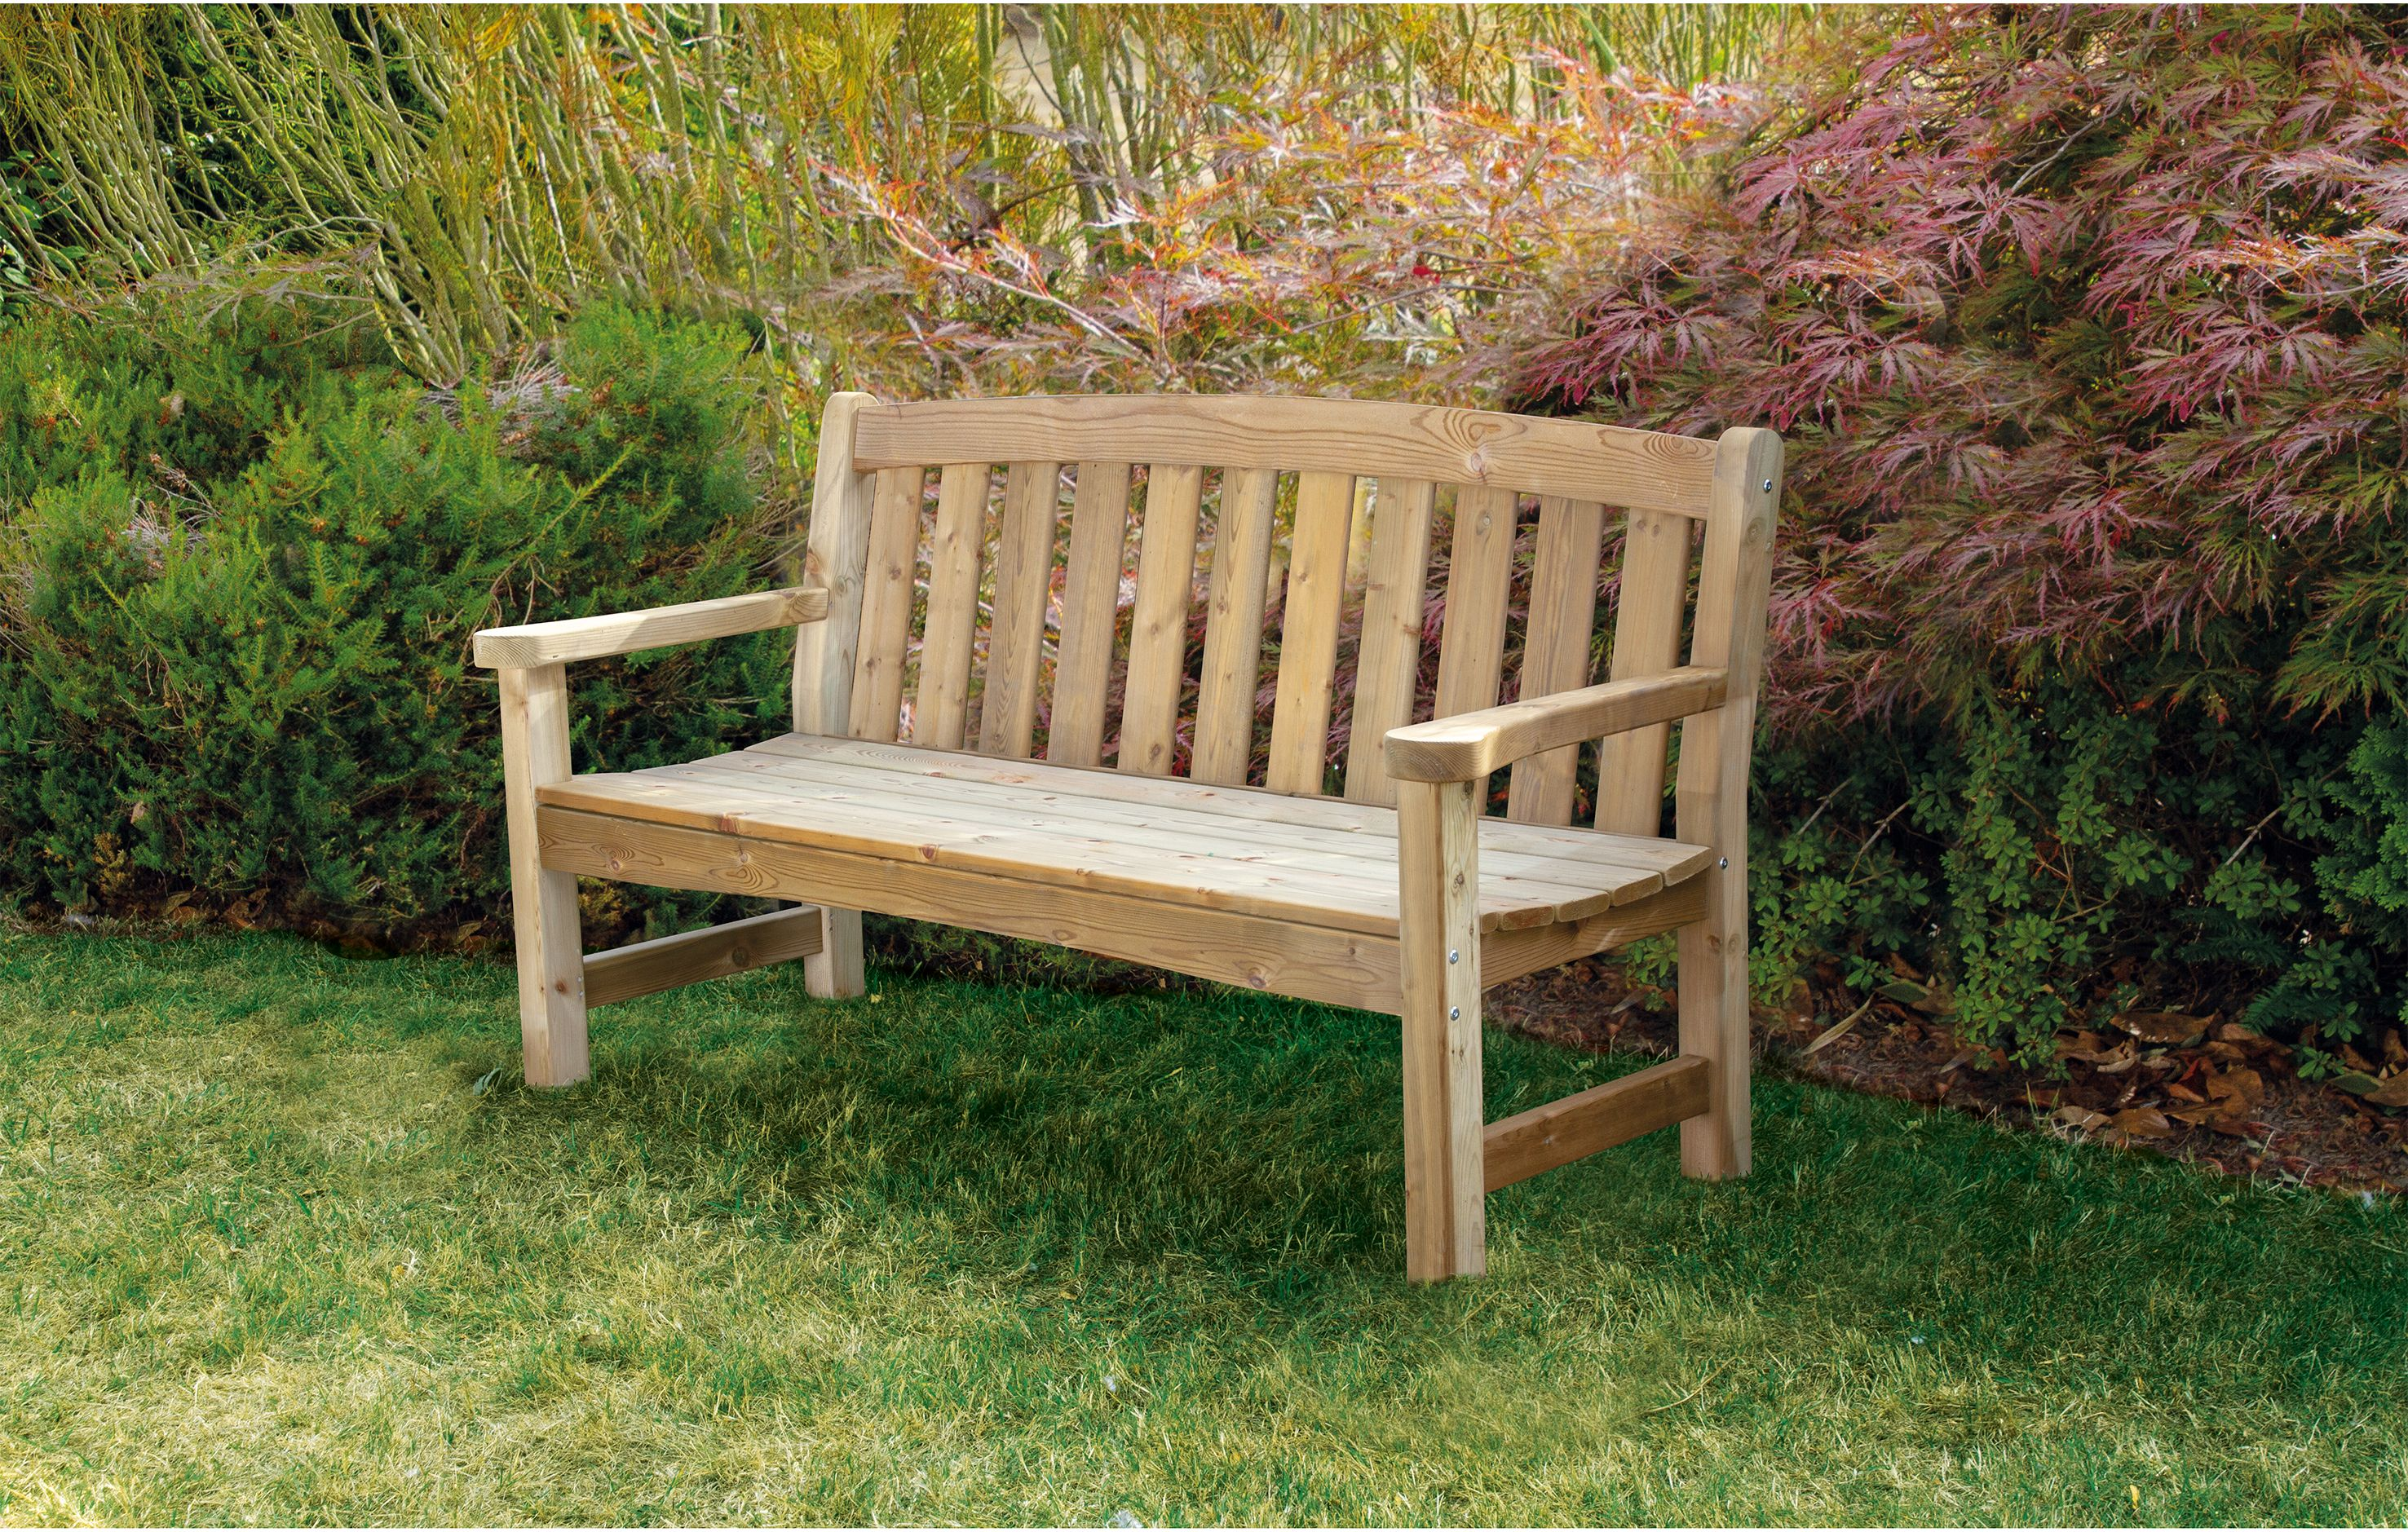 Woodshaw Emsworth 3 Seater Bench Small Garden Bench Wooden